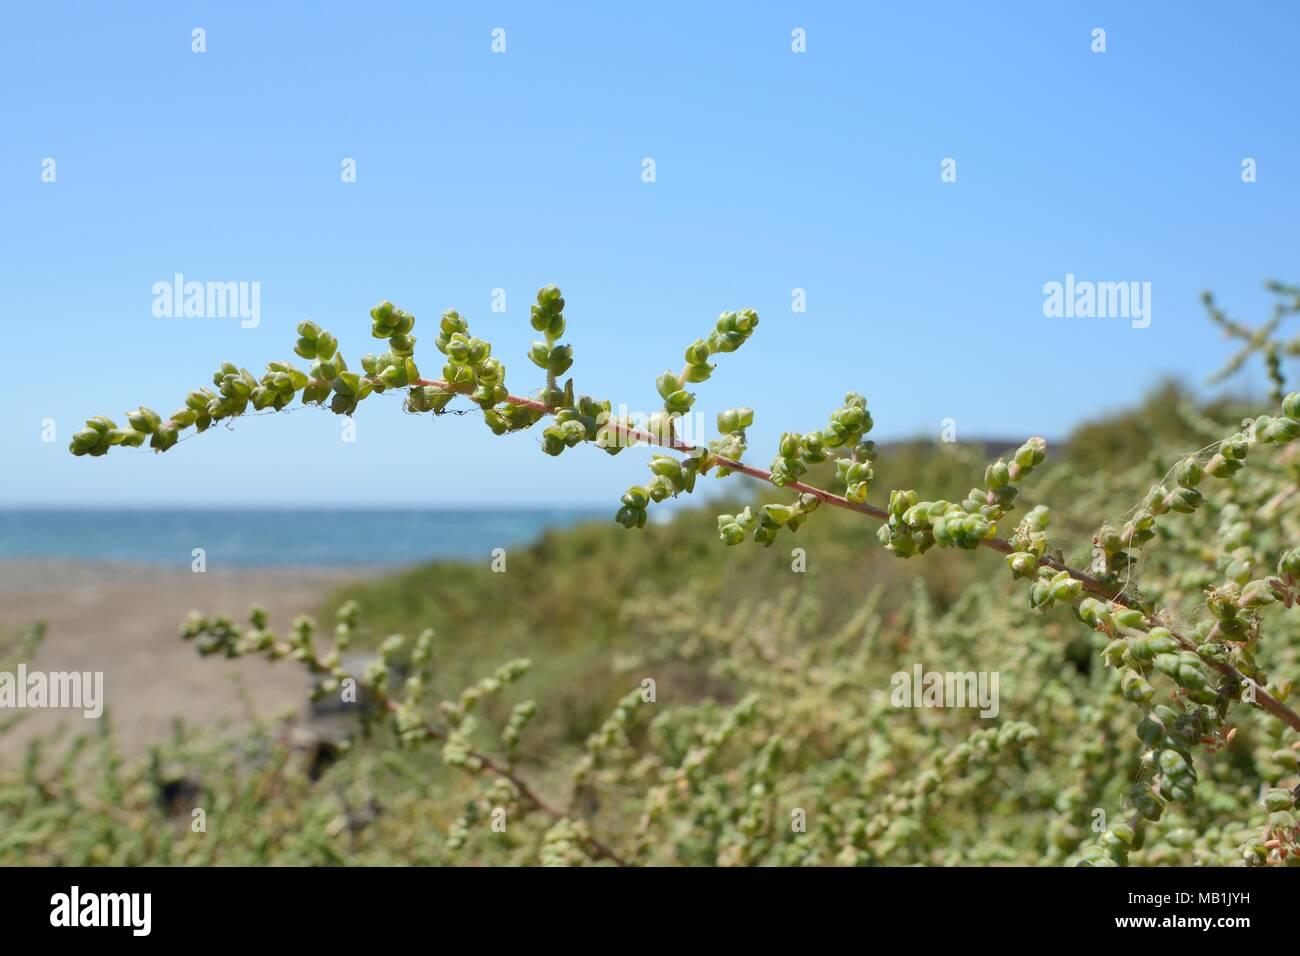 Balancon / Moquini's Traganum (Traganum moquinii) bushes growing on the fringes of a sandy beach, Pozo Negro, Fuerteventura, June. Stock Photo